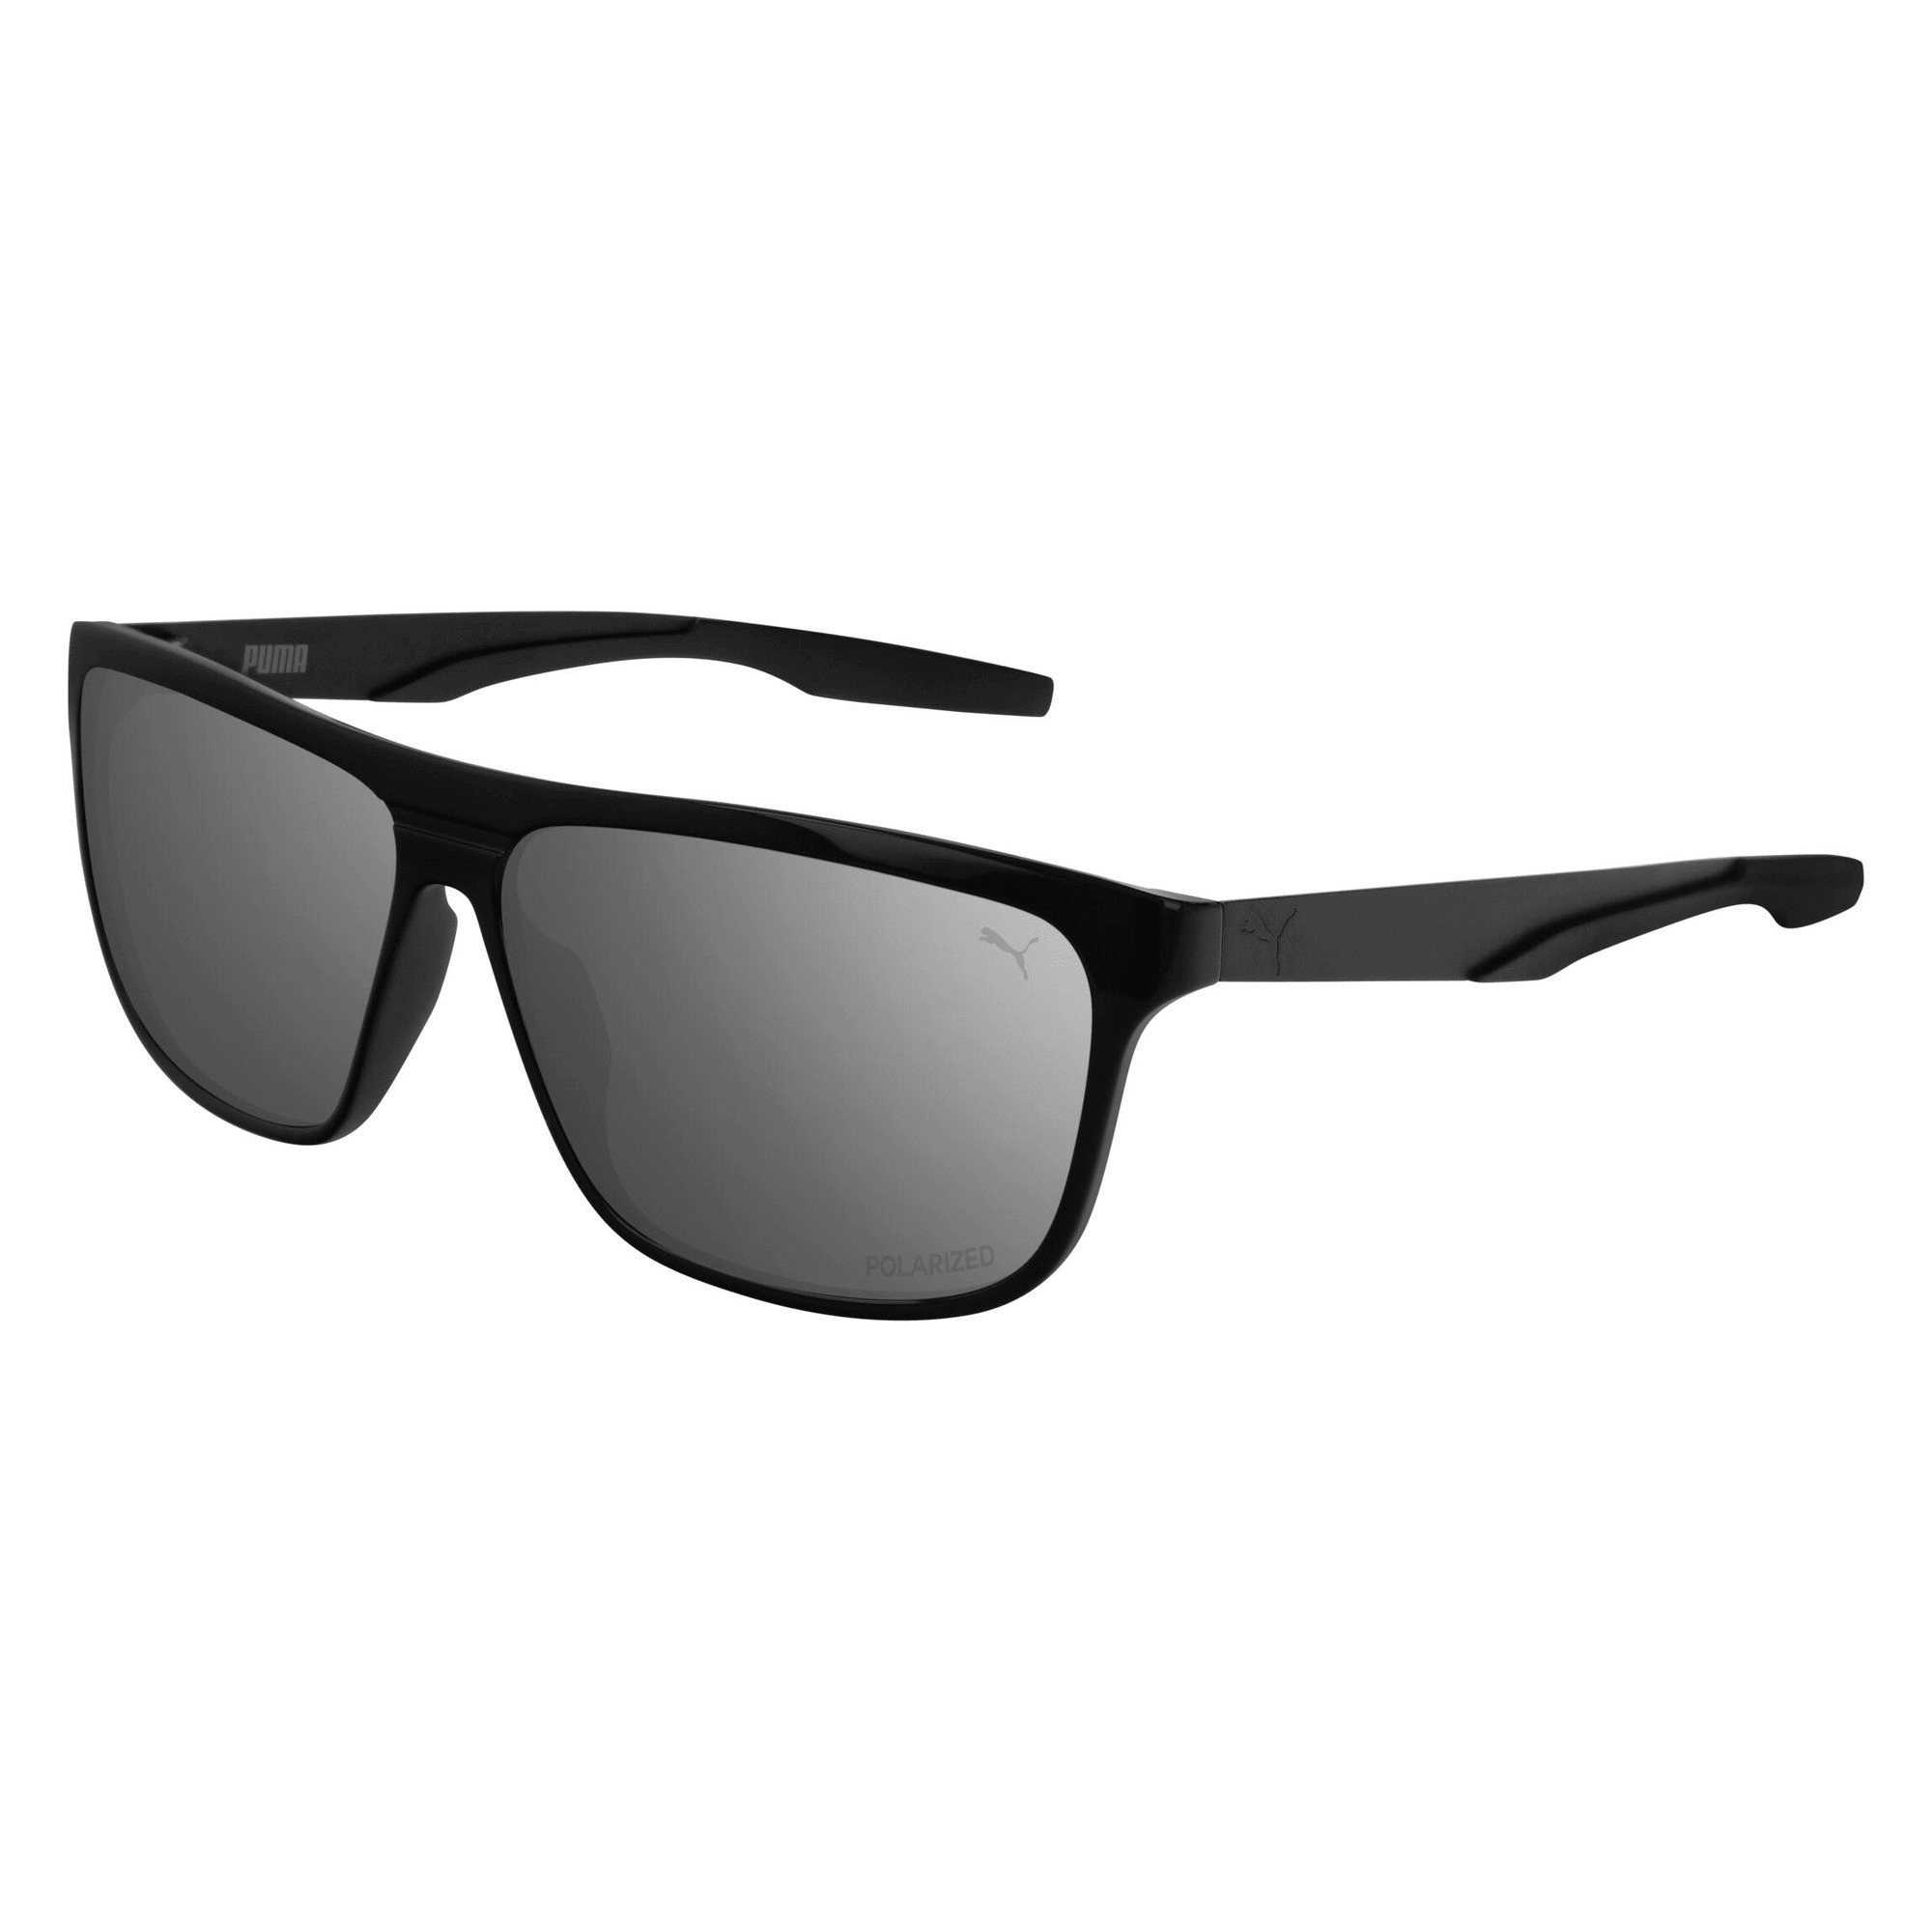 Thumbnail 1 of Laguna Sunglasses, BLACK, medium